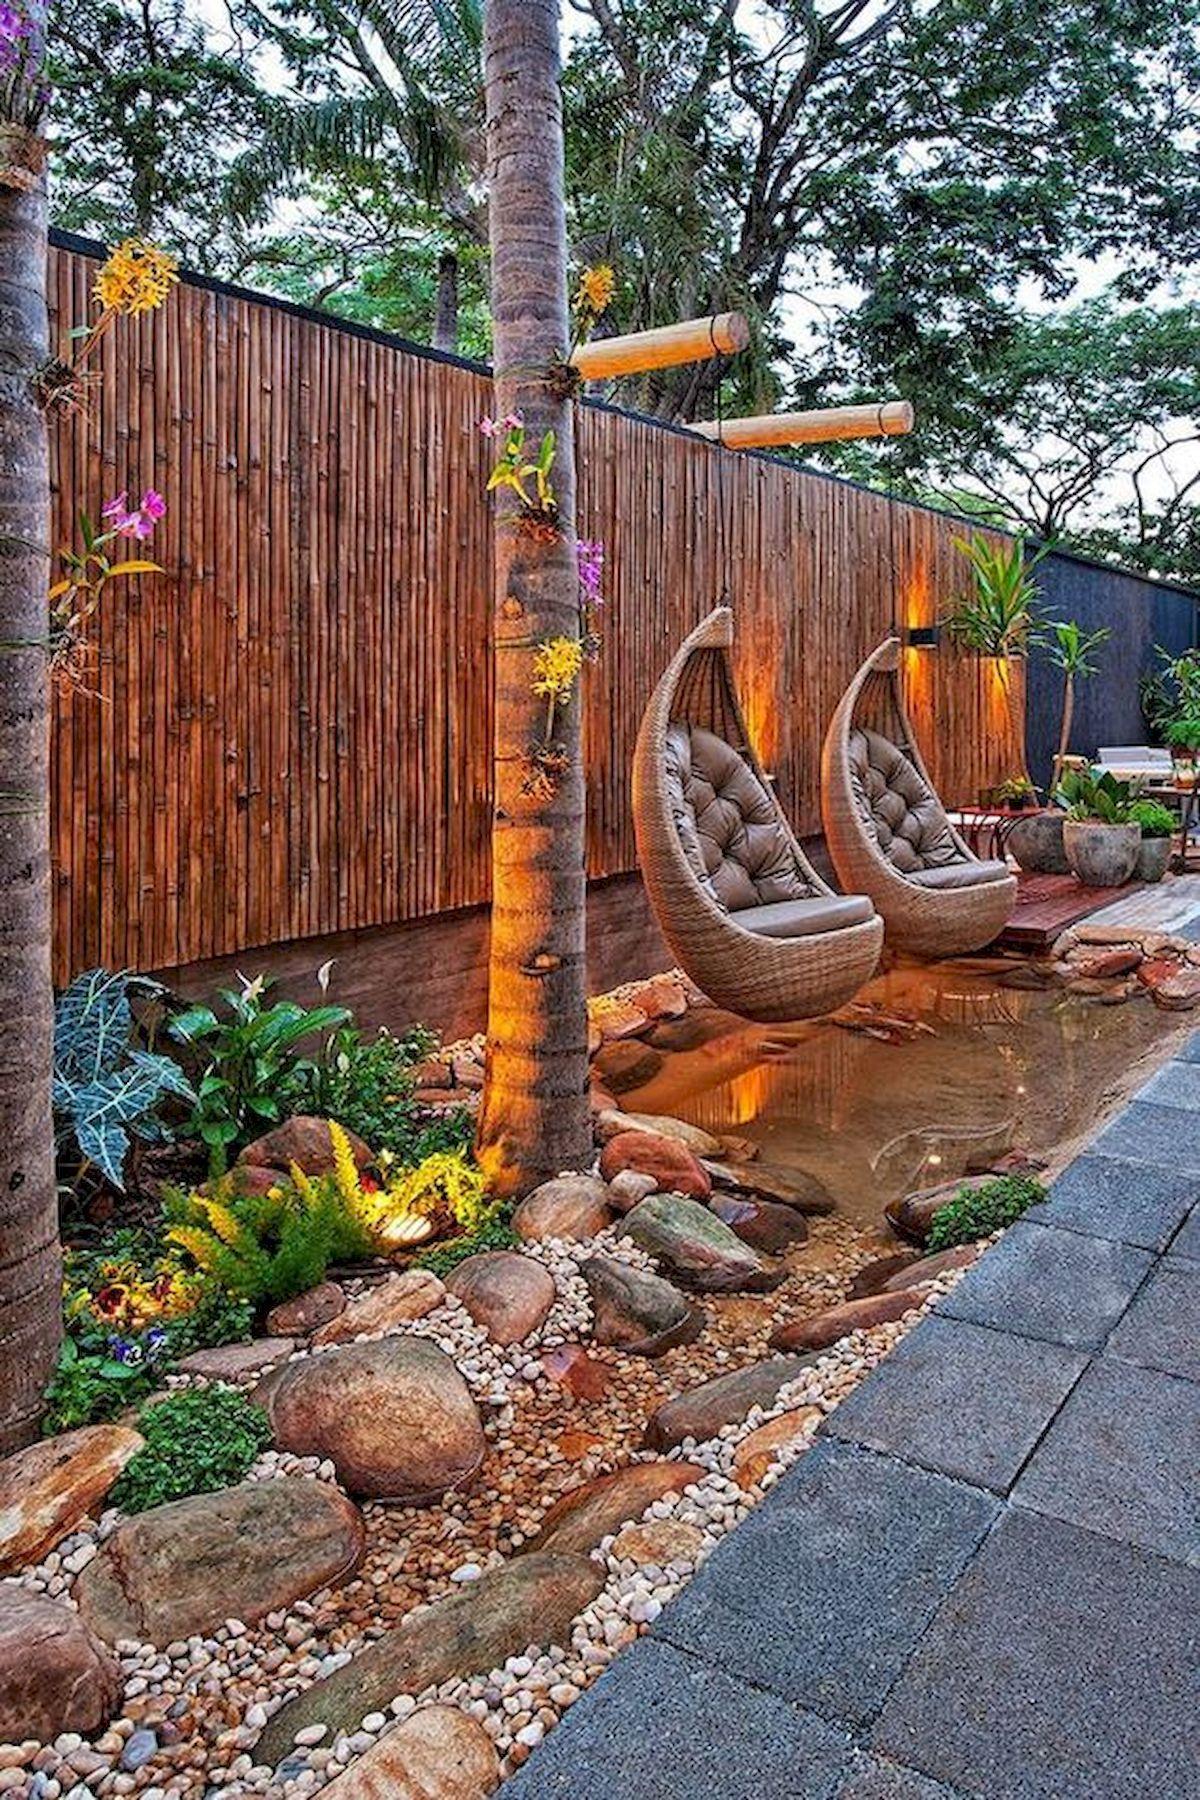 33 Beautiful Backyard Garden Design Ideas